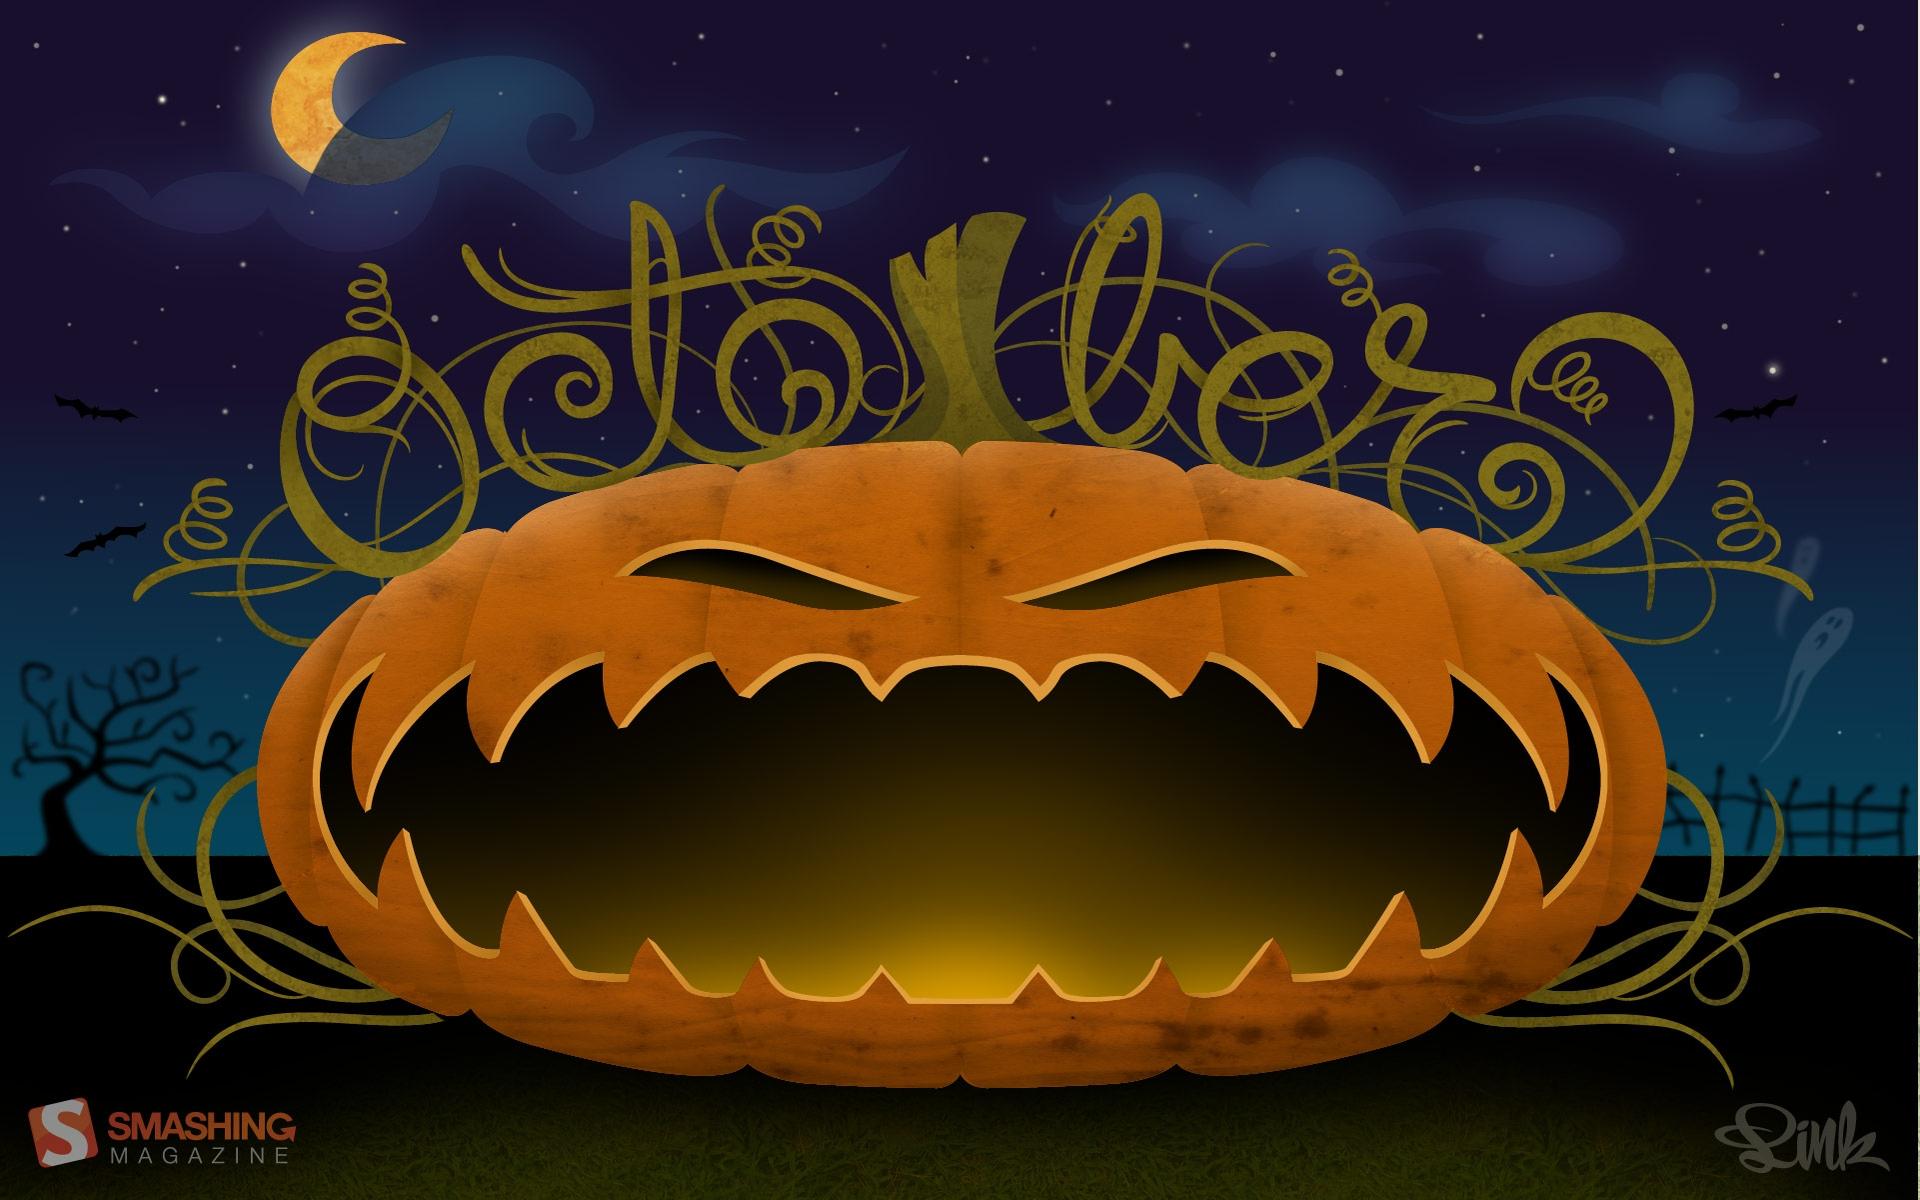 Free Halloween Wallpaper For Desktop - WallpaperSafari